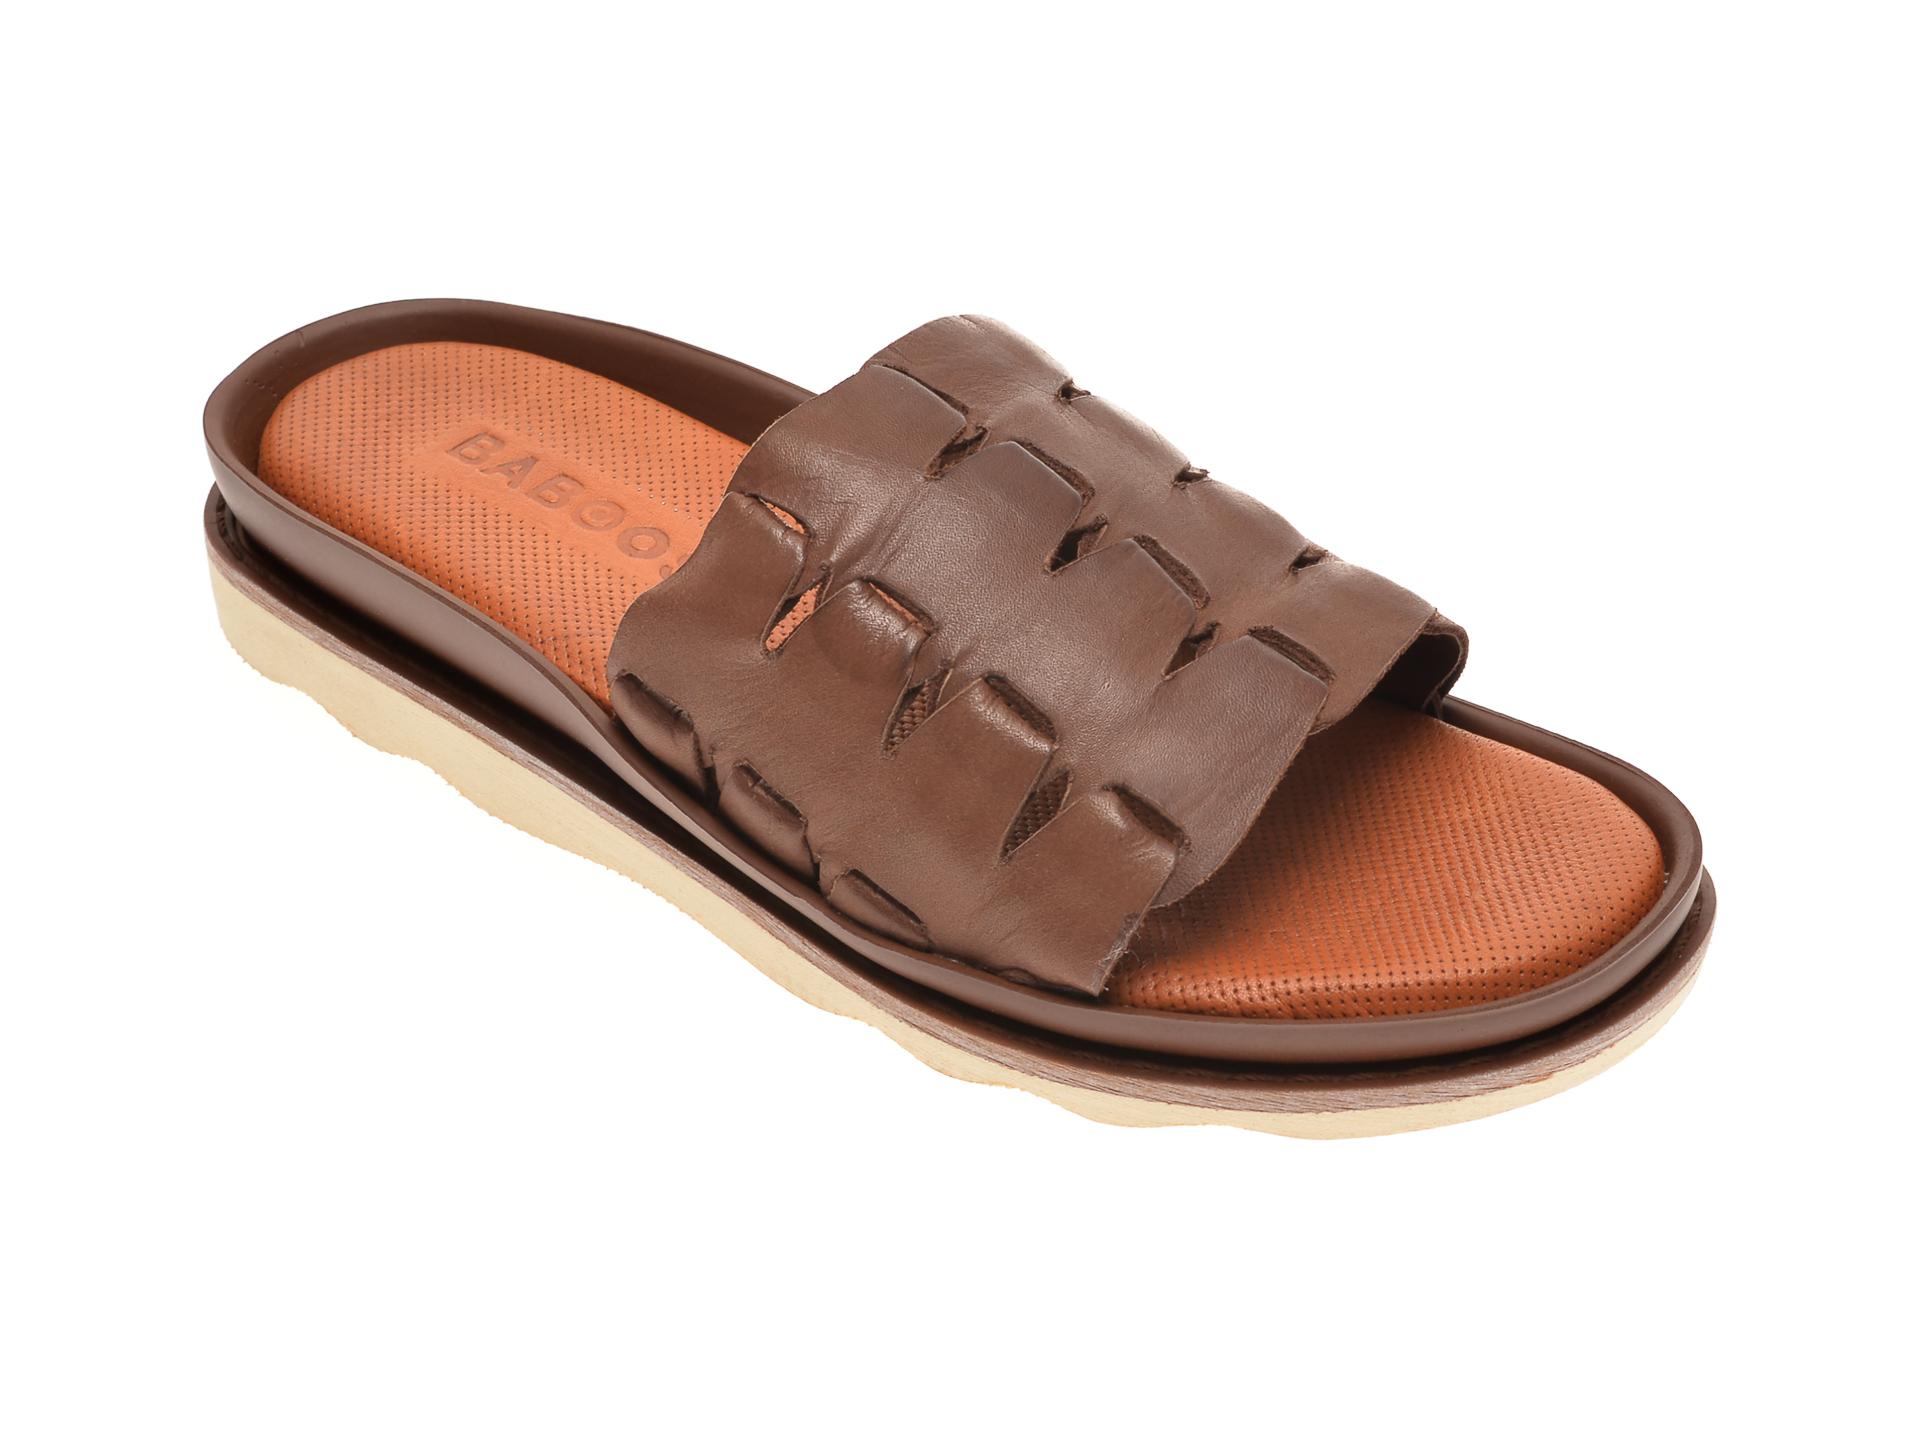 Papuci BABOOS maro, 0407, din piele naturala imagine